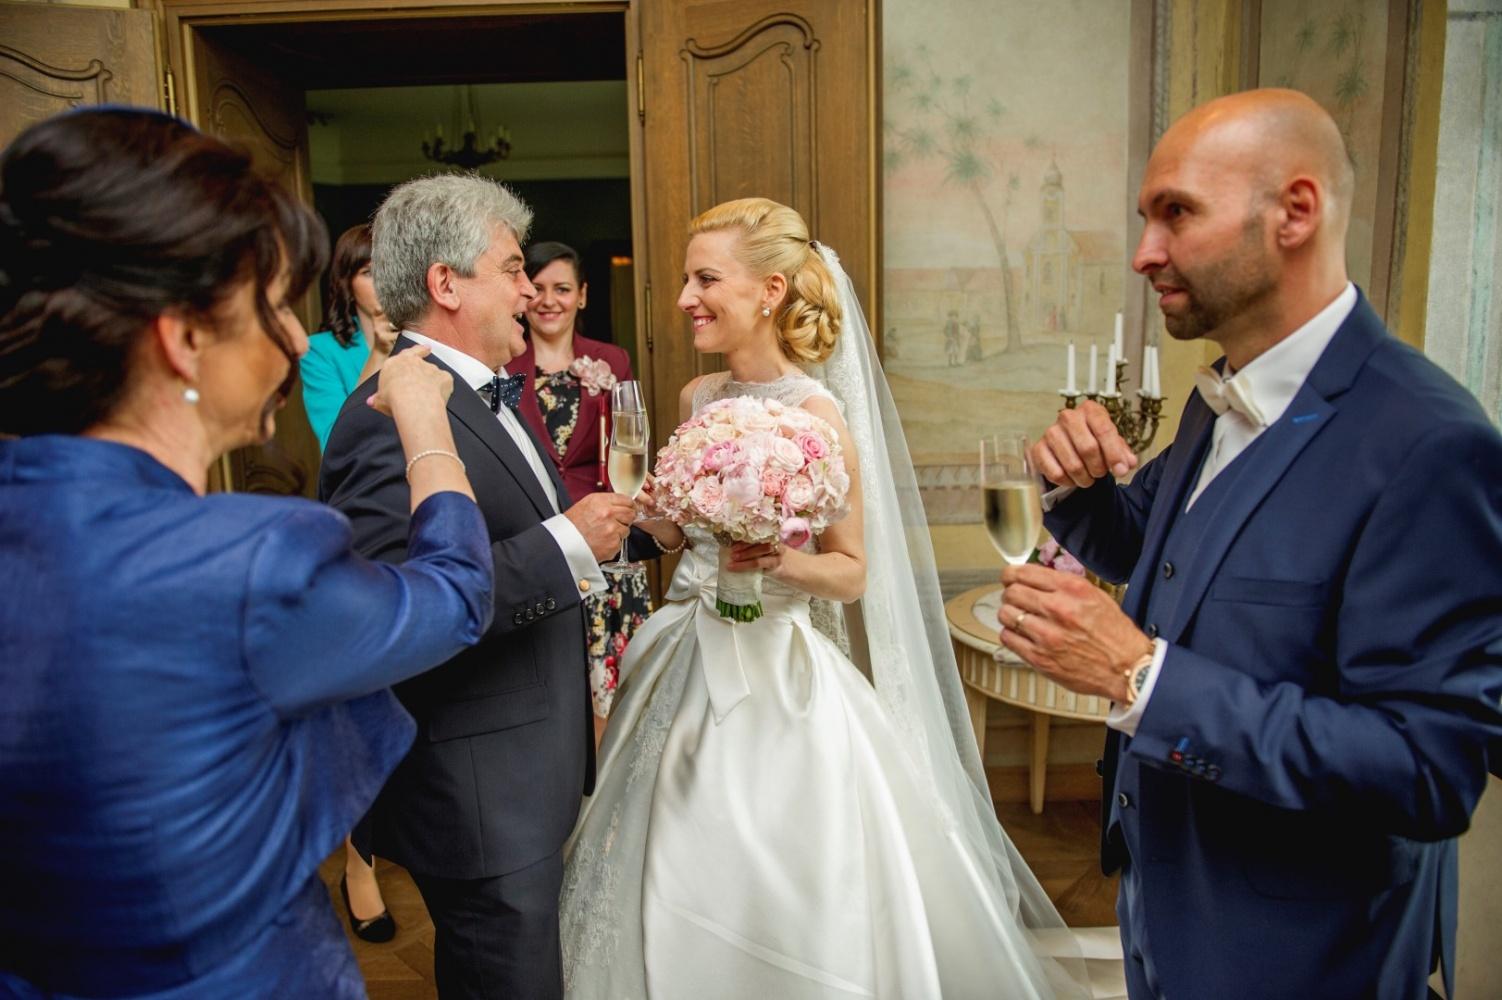 http://www.fotoz.sk/images/gallery-26/normal/svadba_hotel-chateau-bela_095.jpg